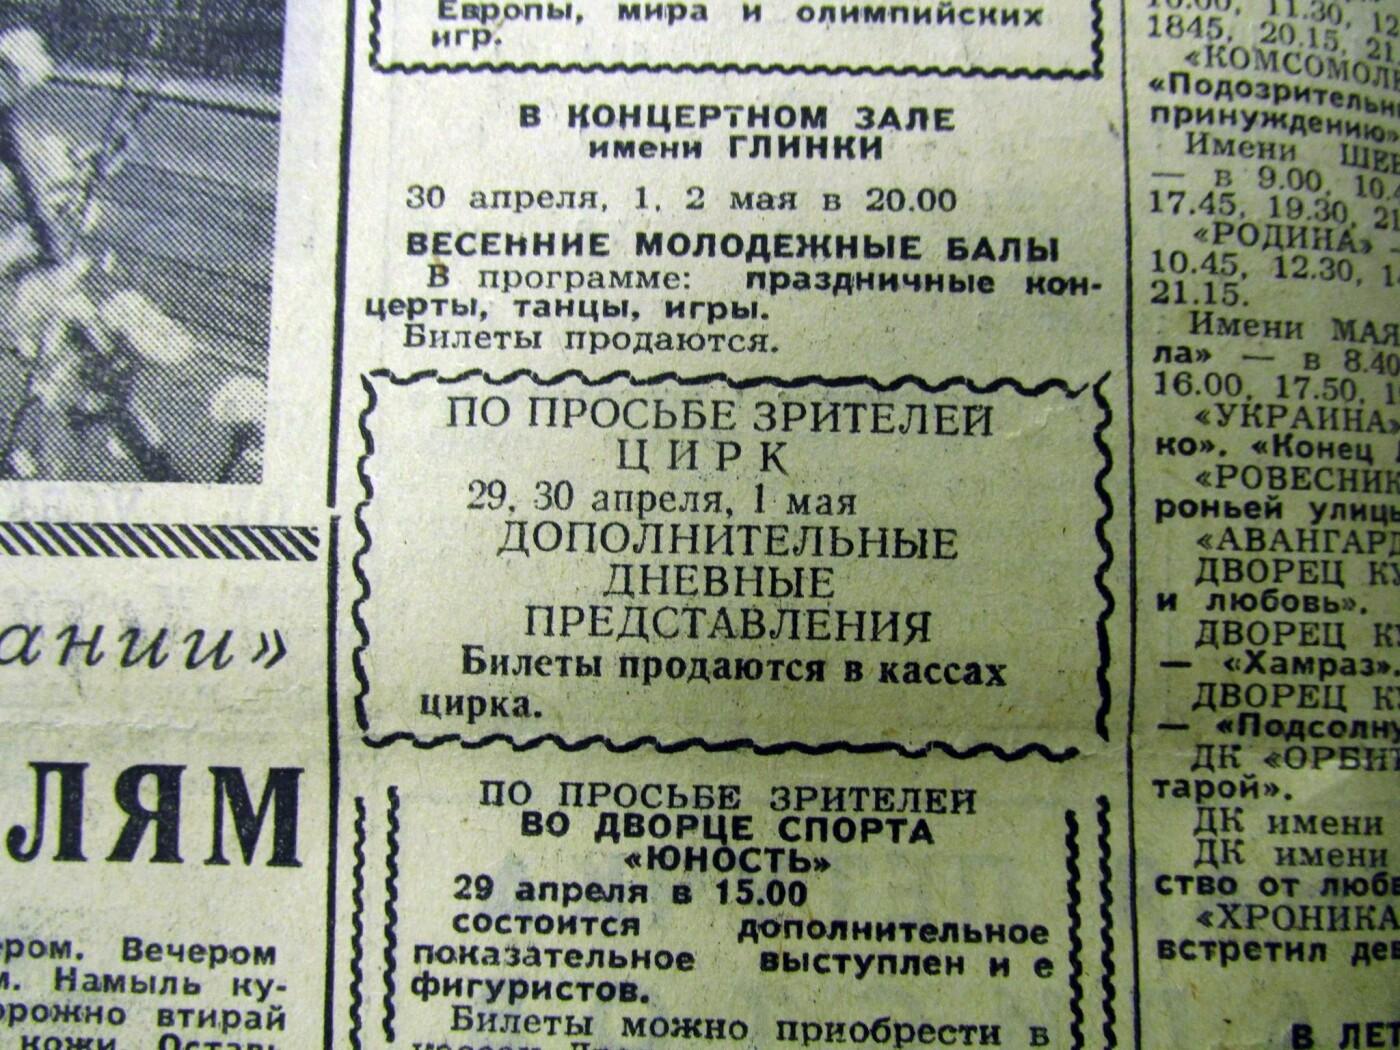 """Работали под самыми облаками"": как в Запорожье строили здание цирка, - ФОТО, фото-21"